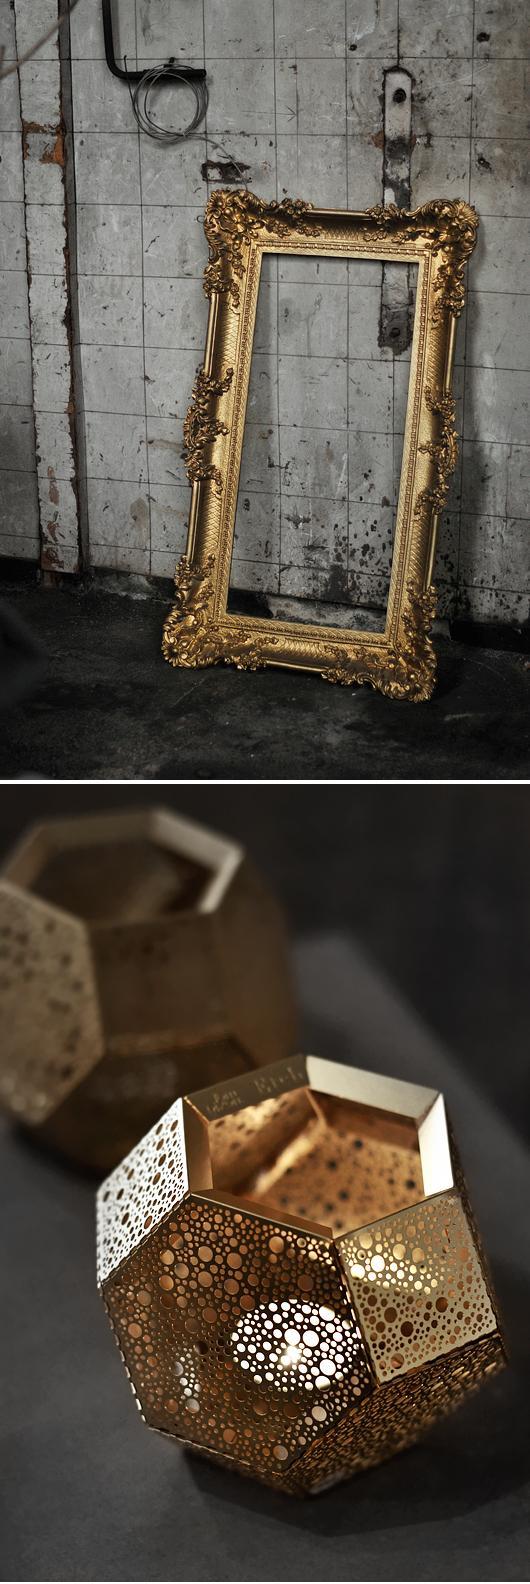 Trendenser - Dagens guldkorn